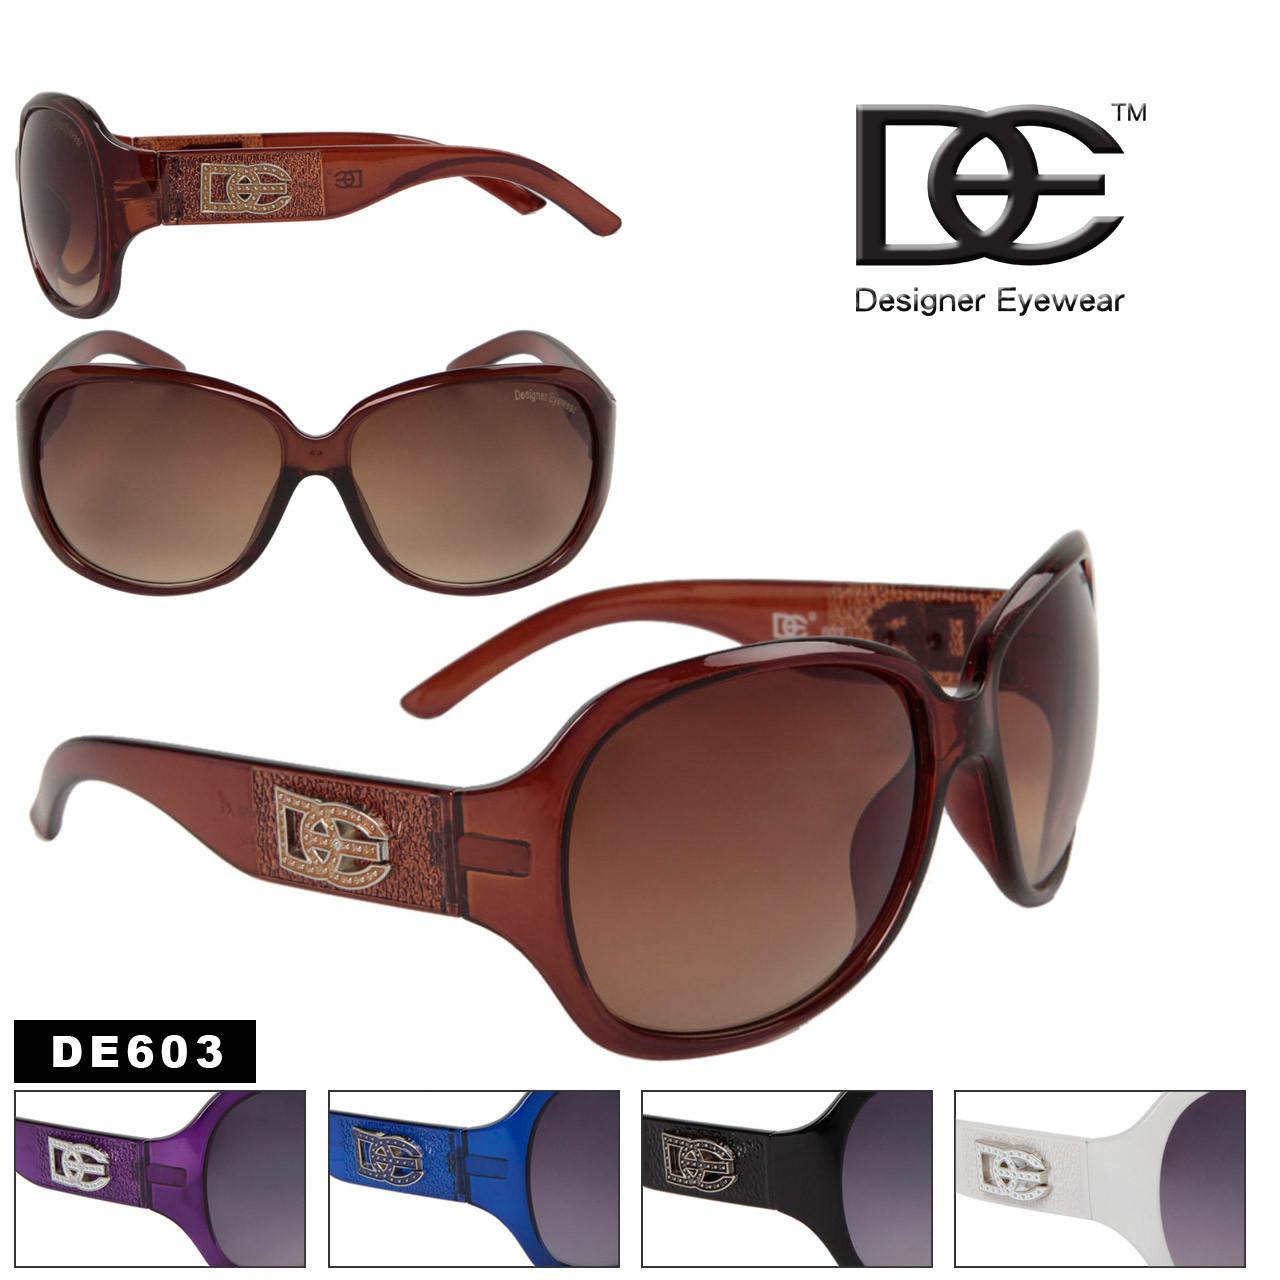 DE603 Designer Eyewear Women's Sunglasses